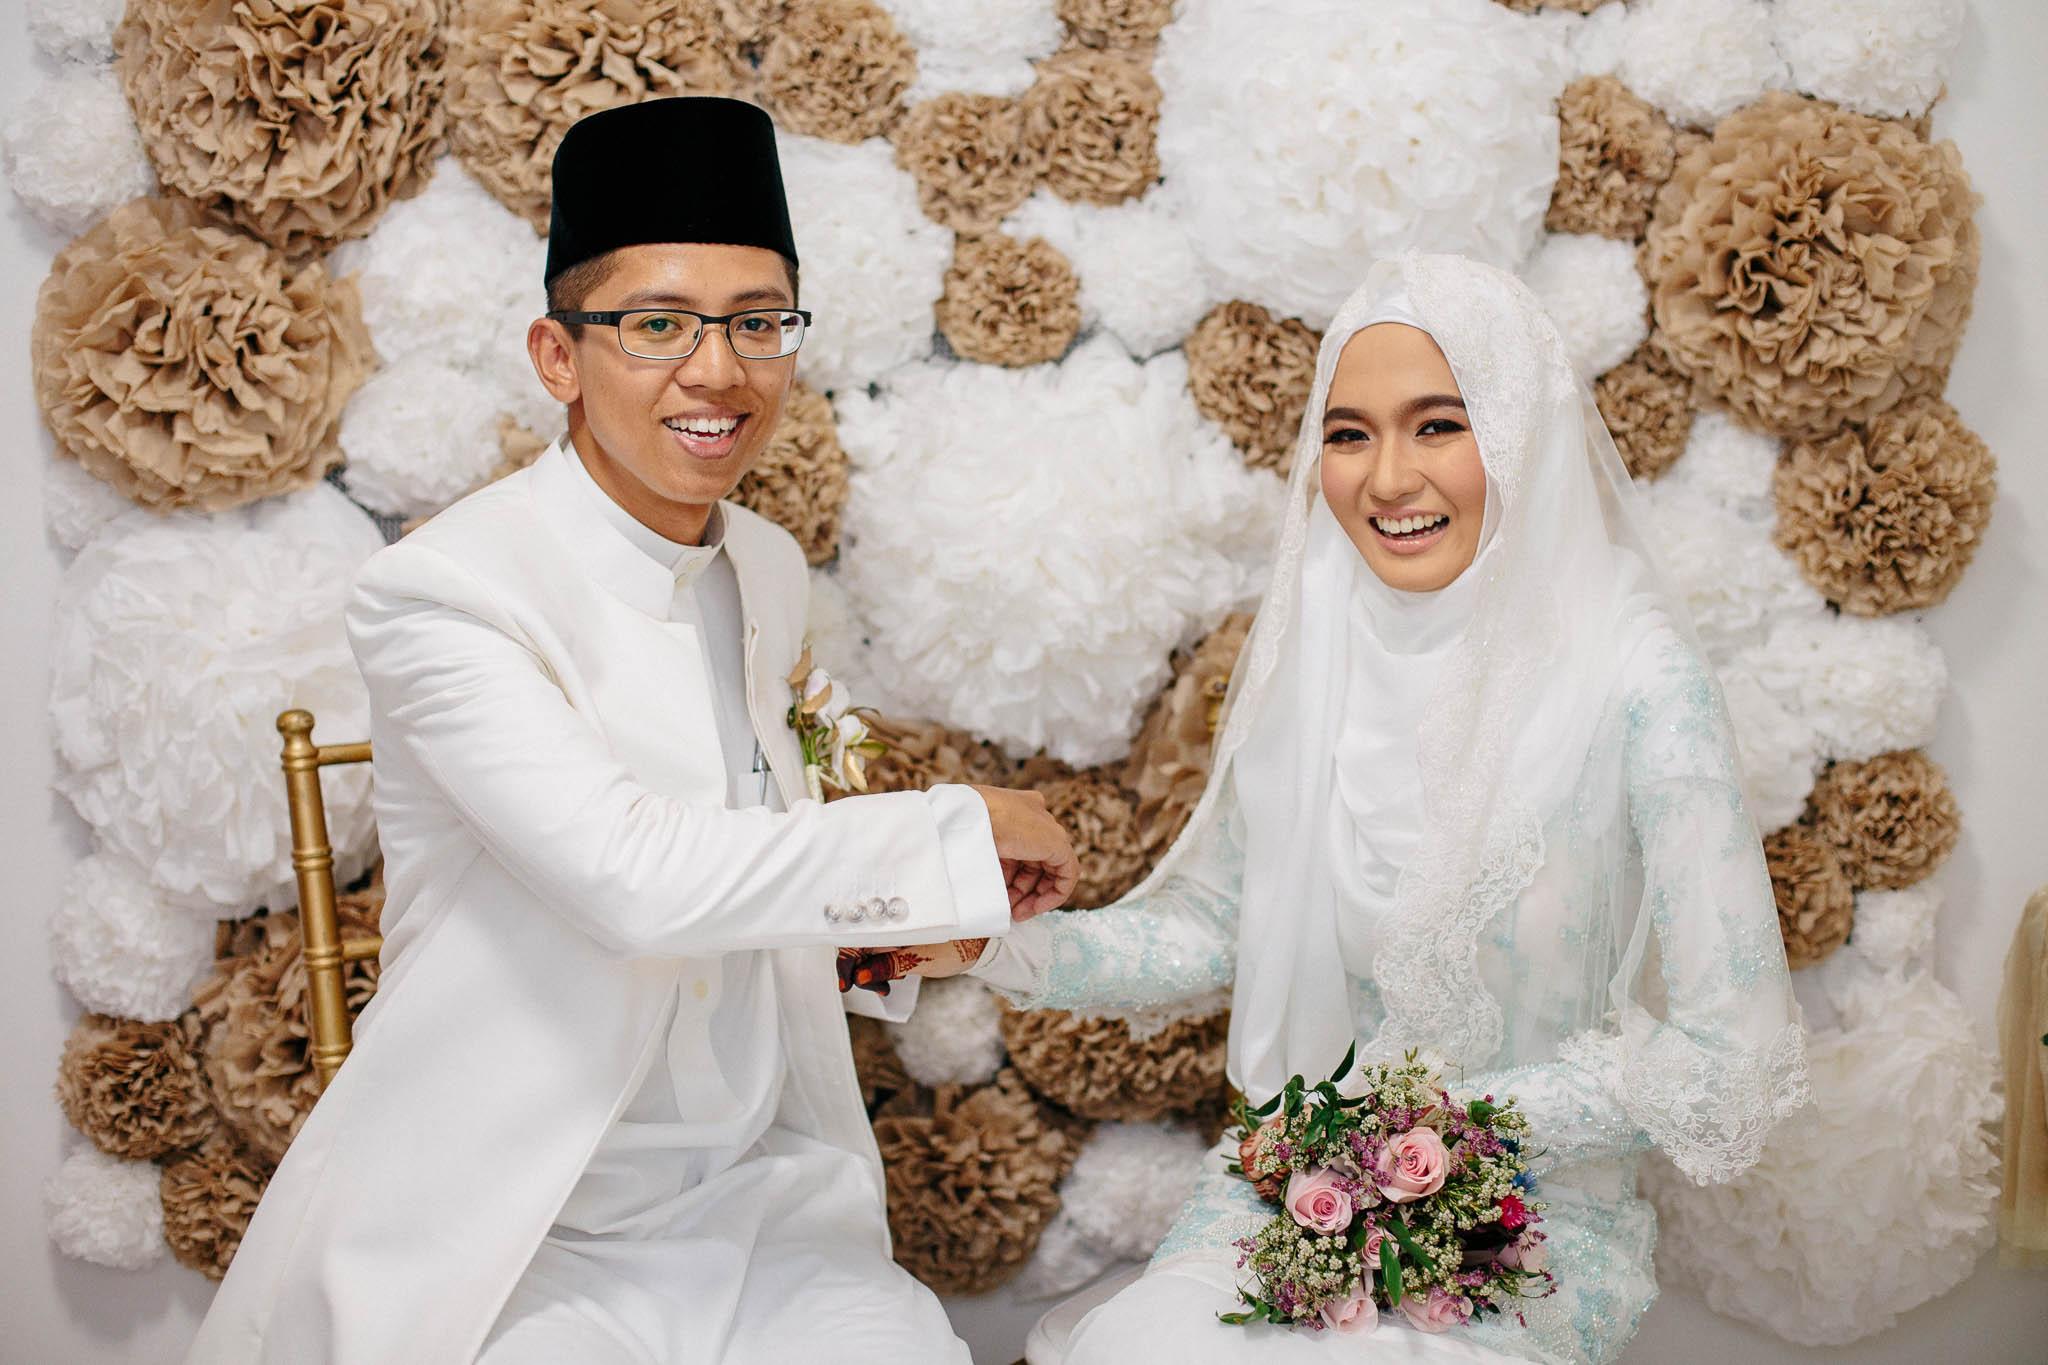 singapore-wedding-photographer-sharalyn-syazwan-021.jpg